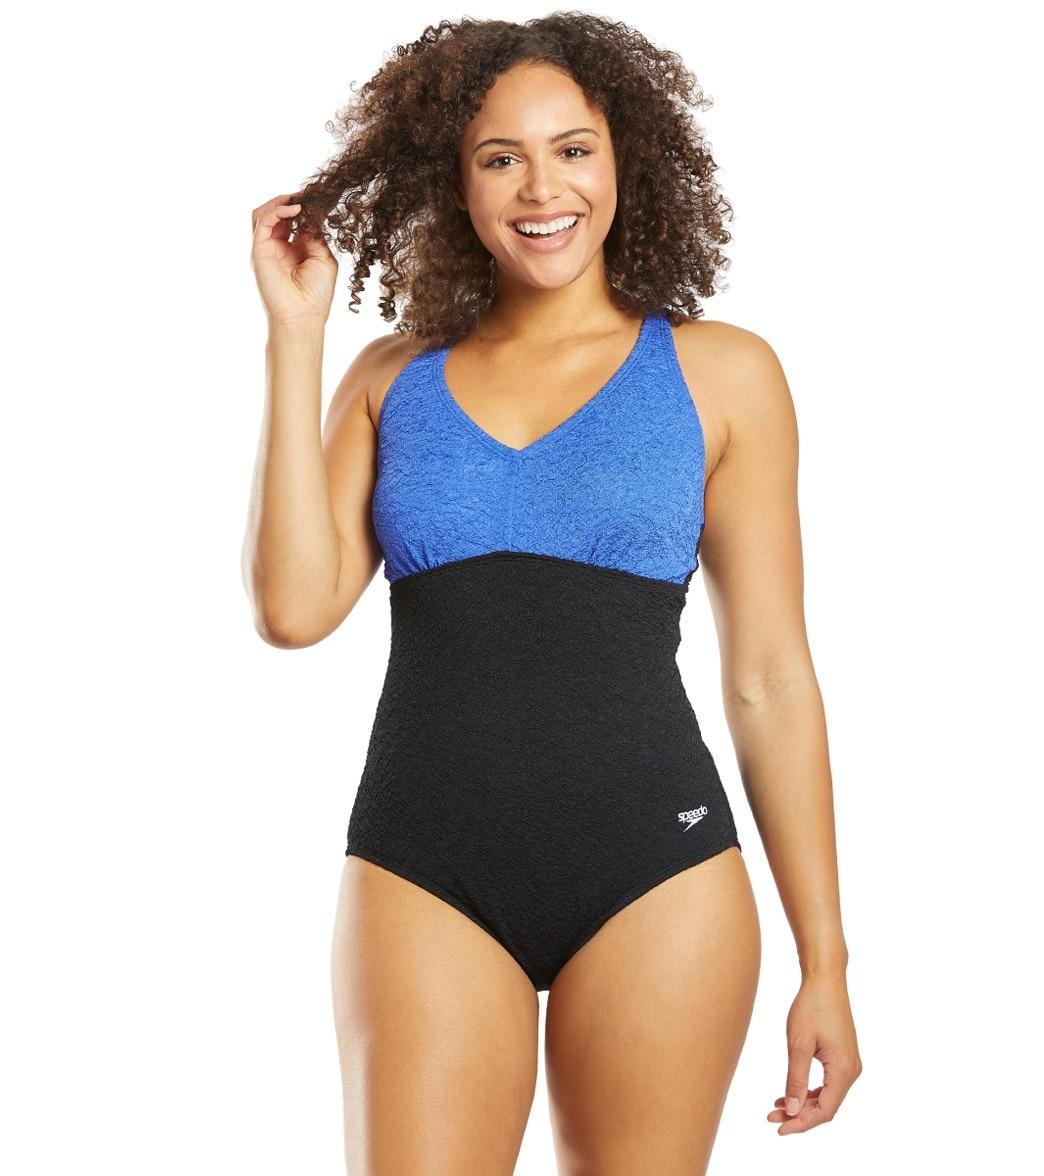 Speedo Women's Pebble Textureblock One Piece Swimsuit